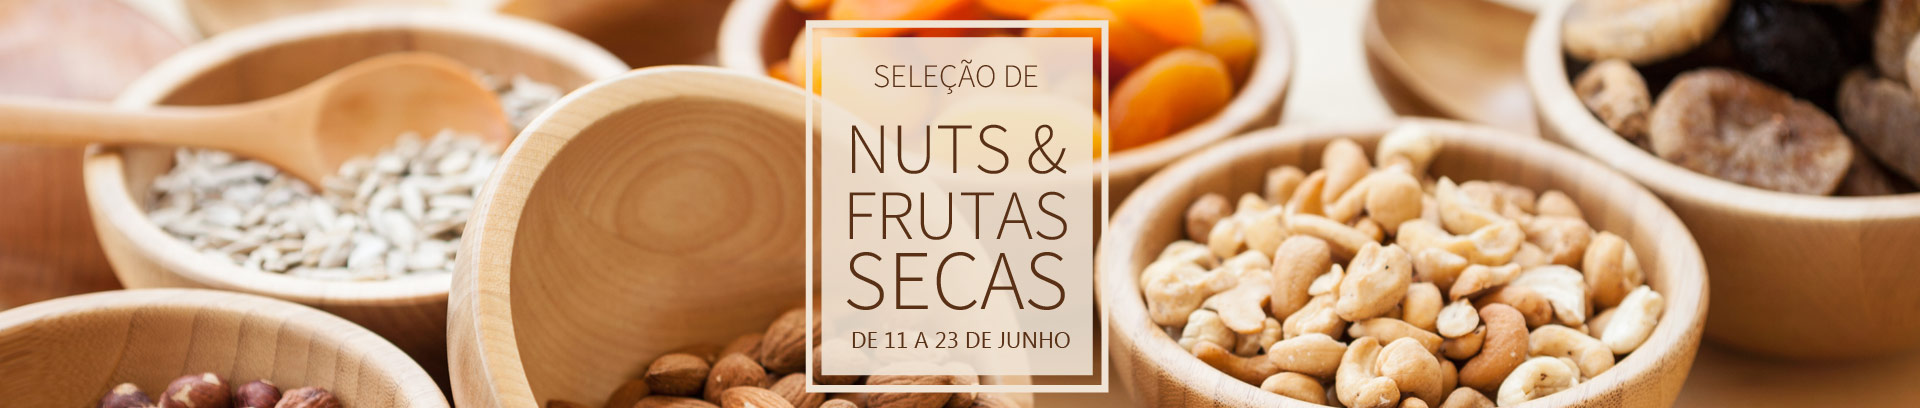 banner_frutassecas